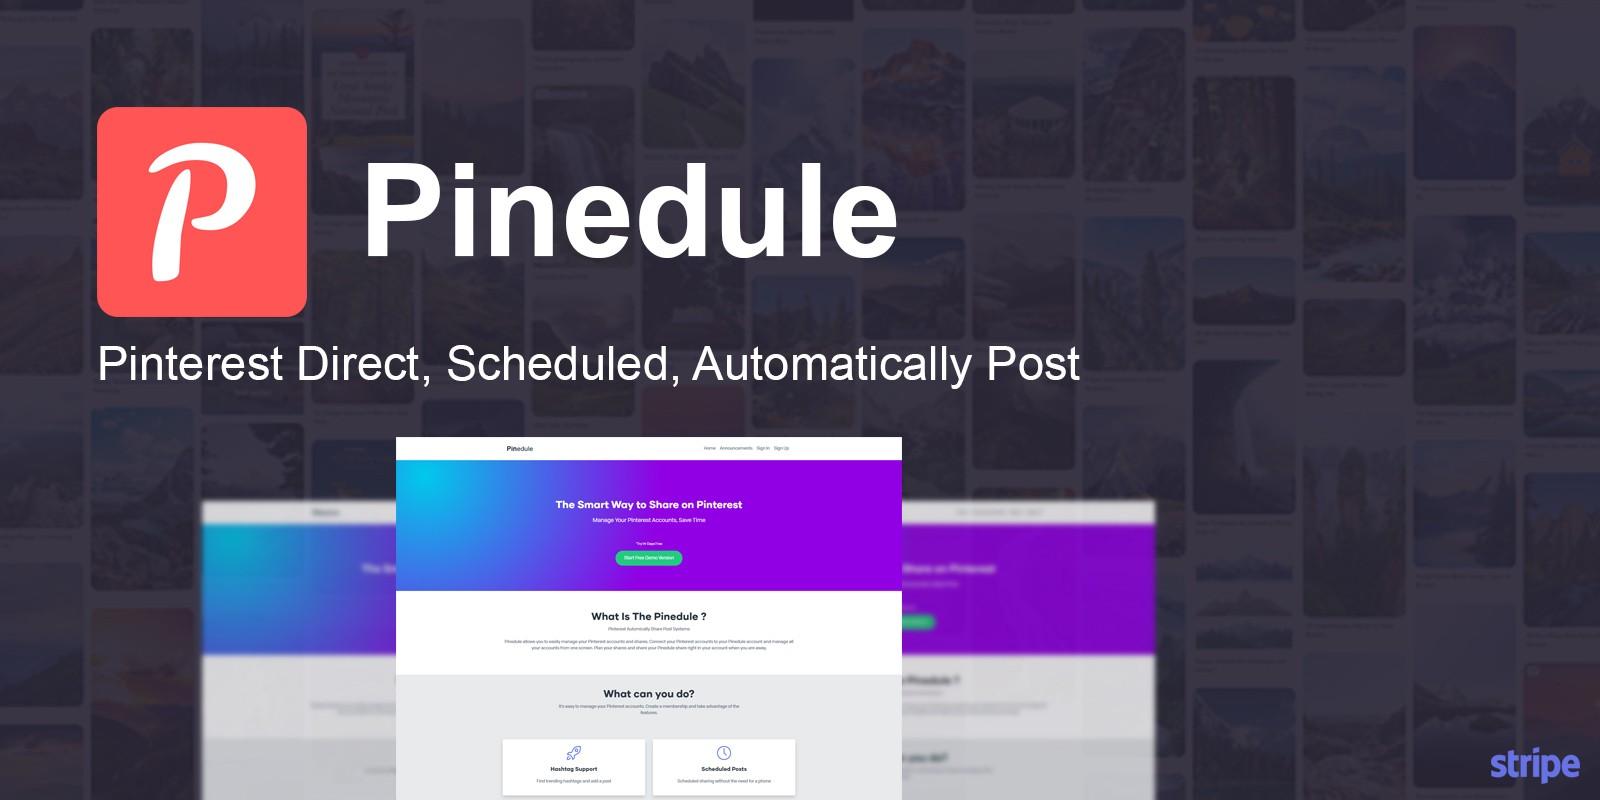 Pinedule - Pinterest Auto Post Script